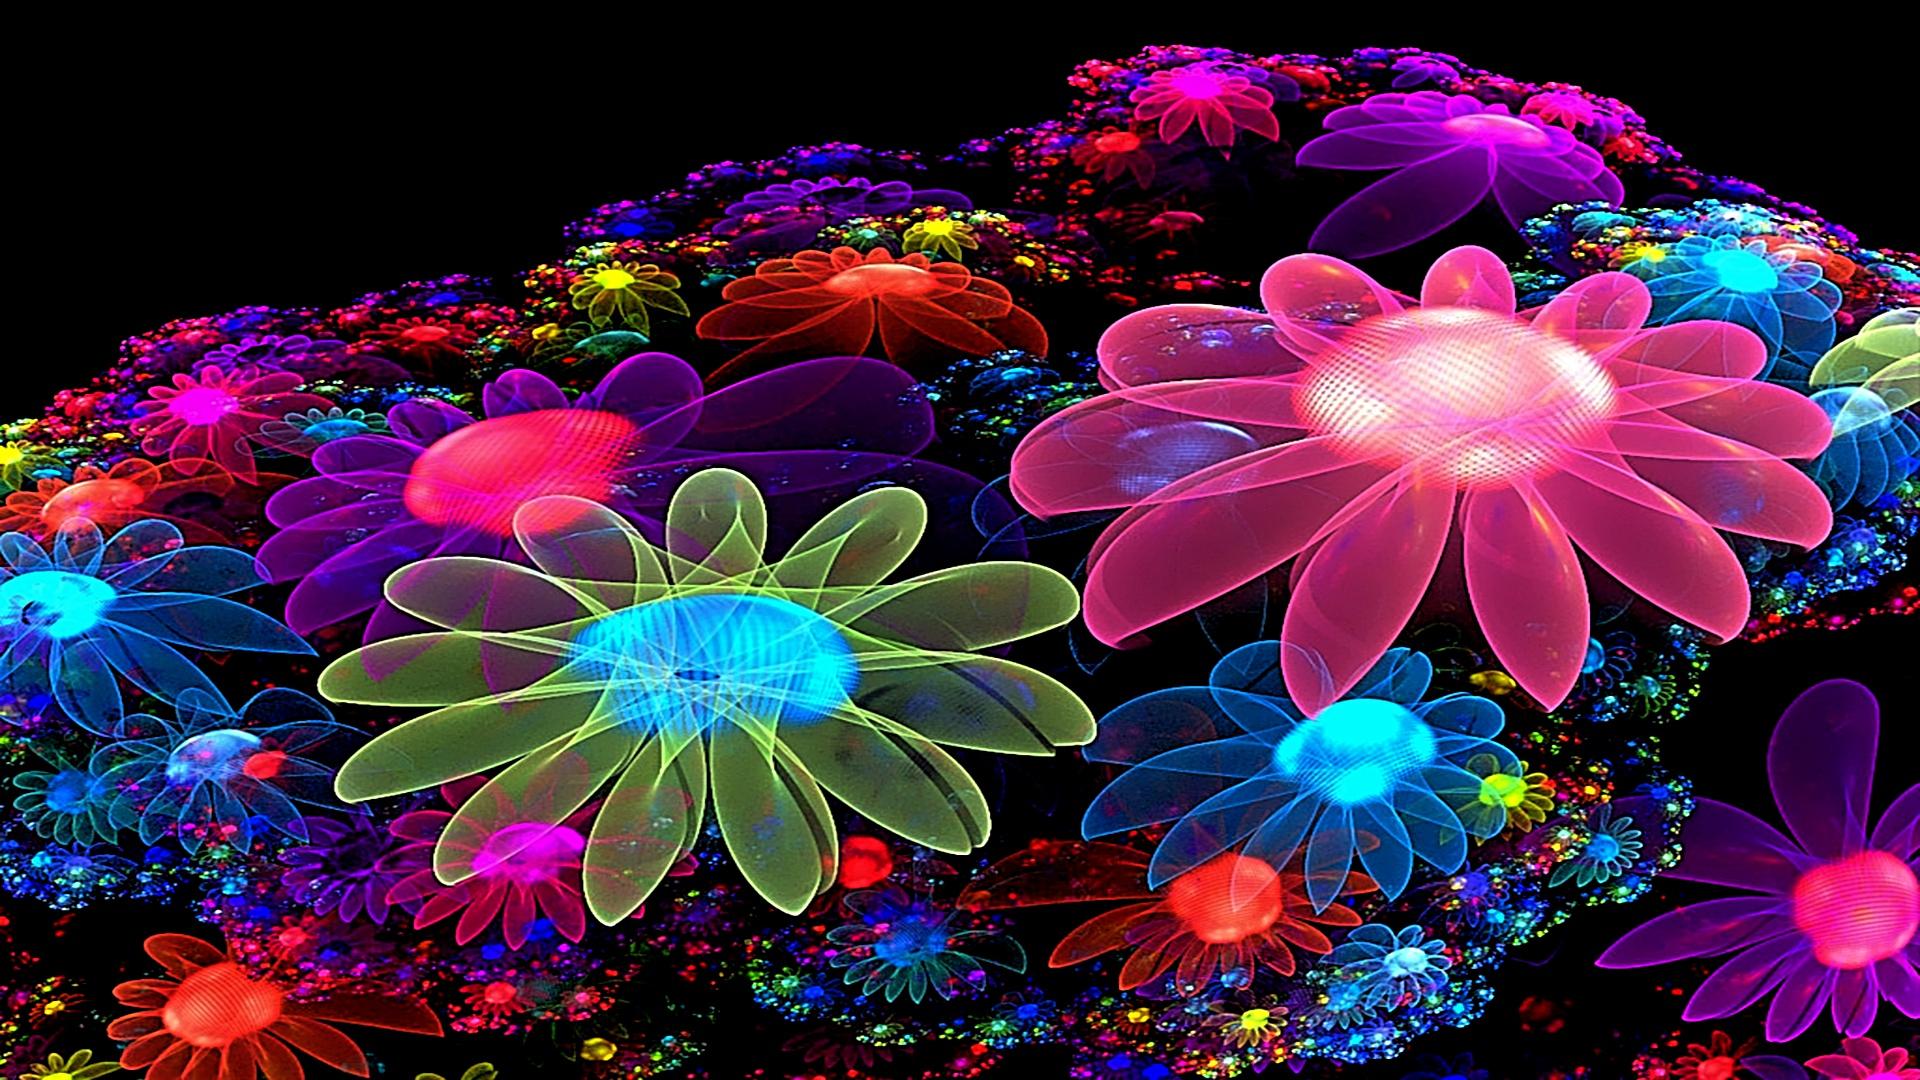 neonflowers